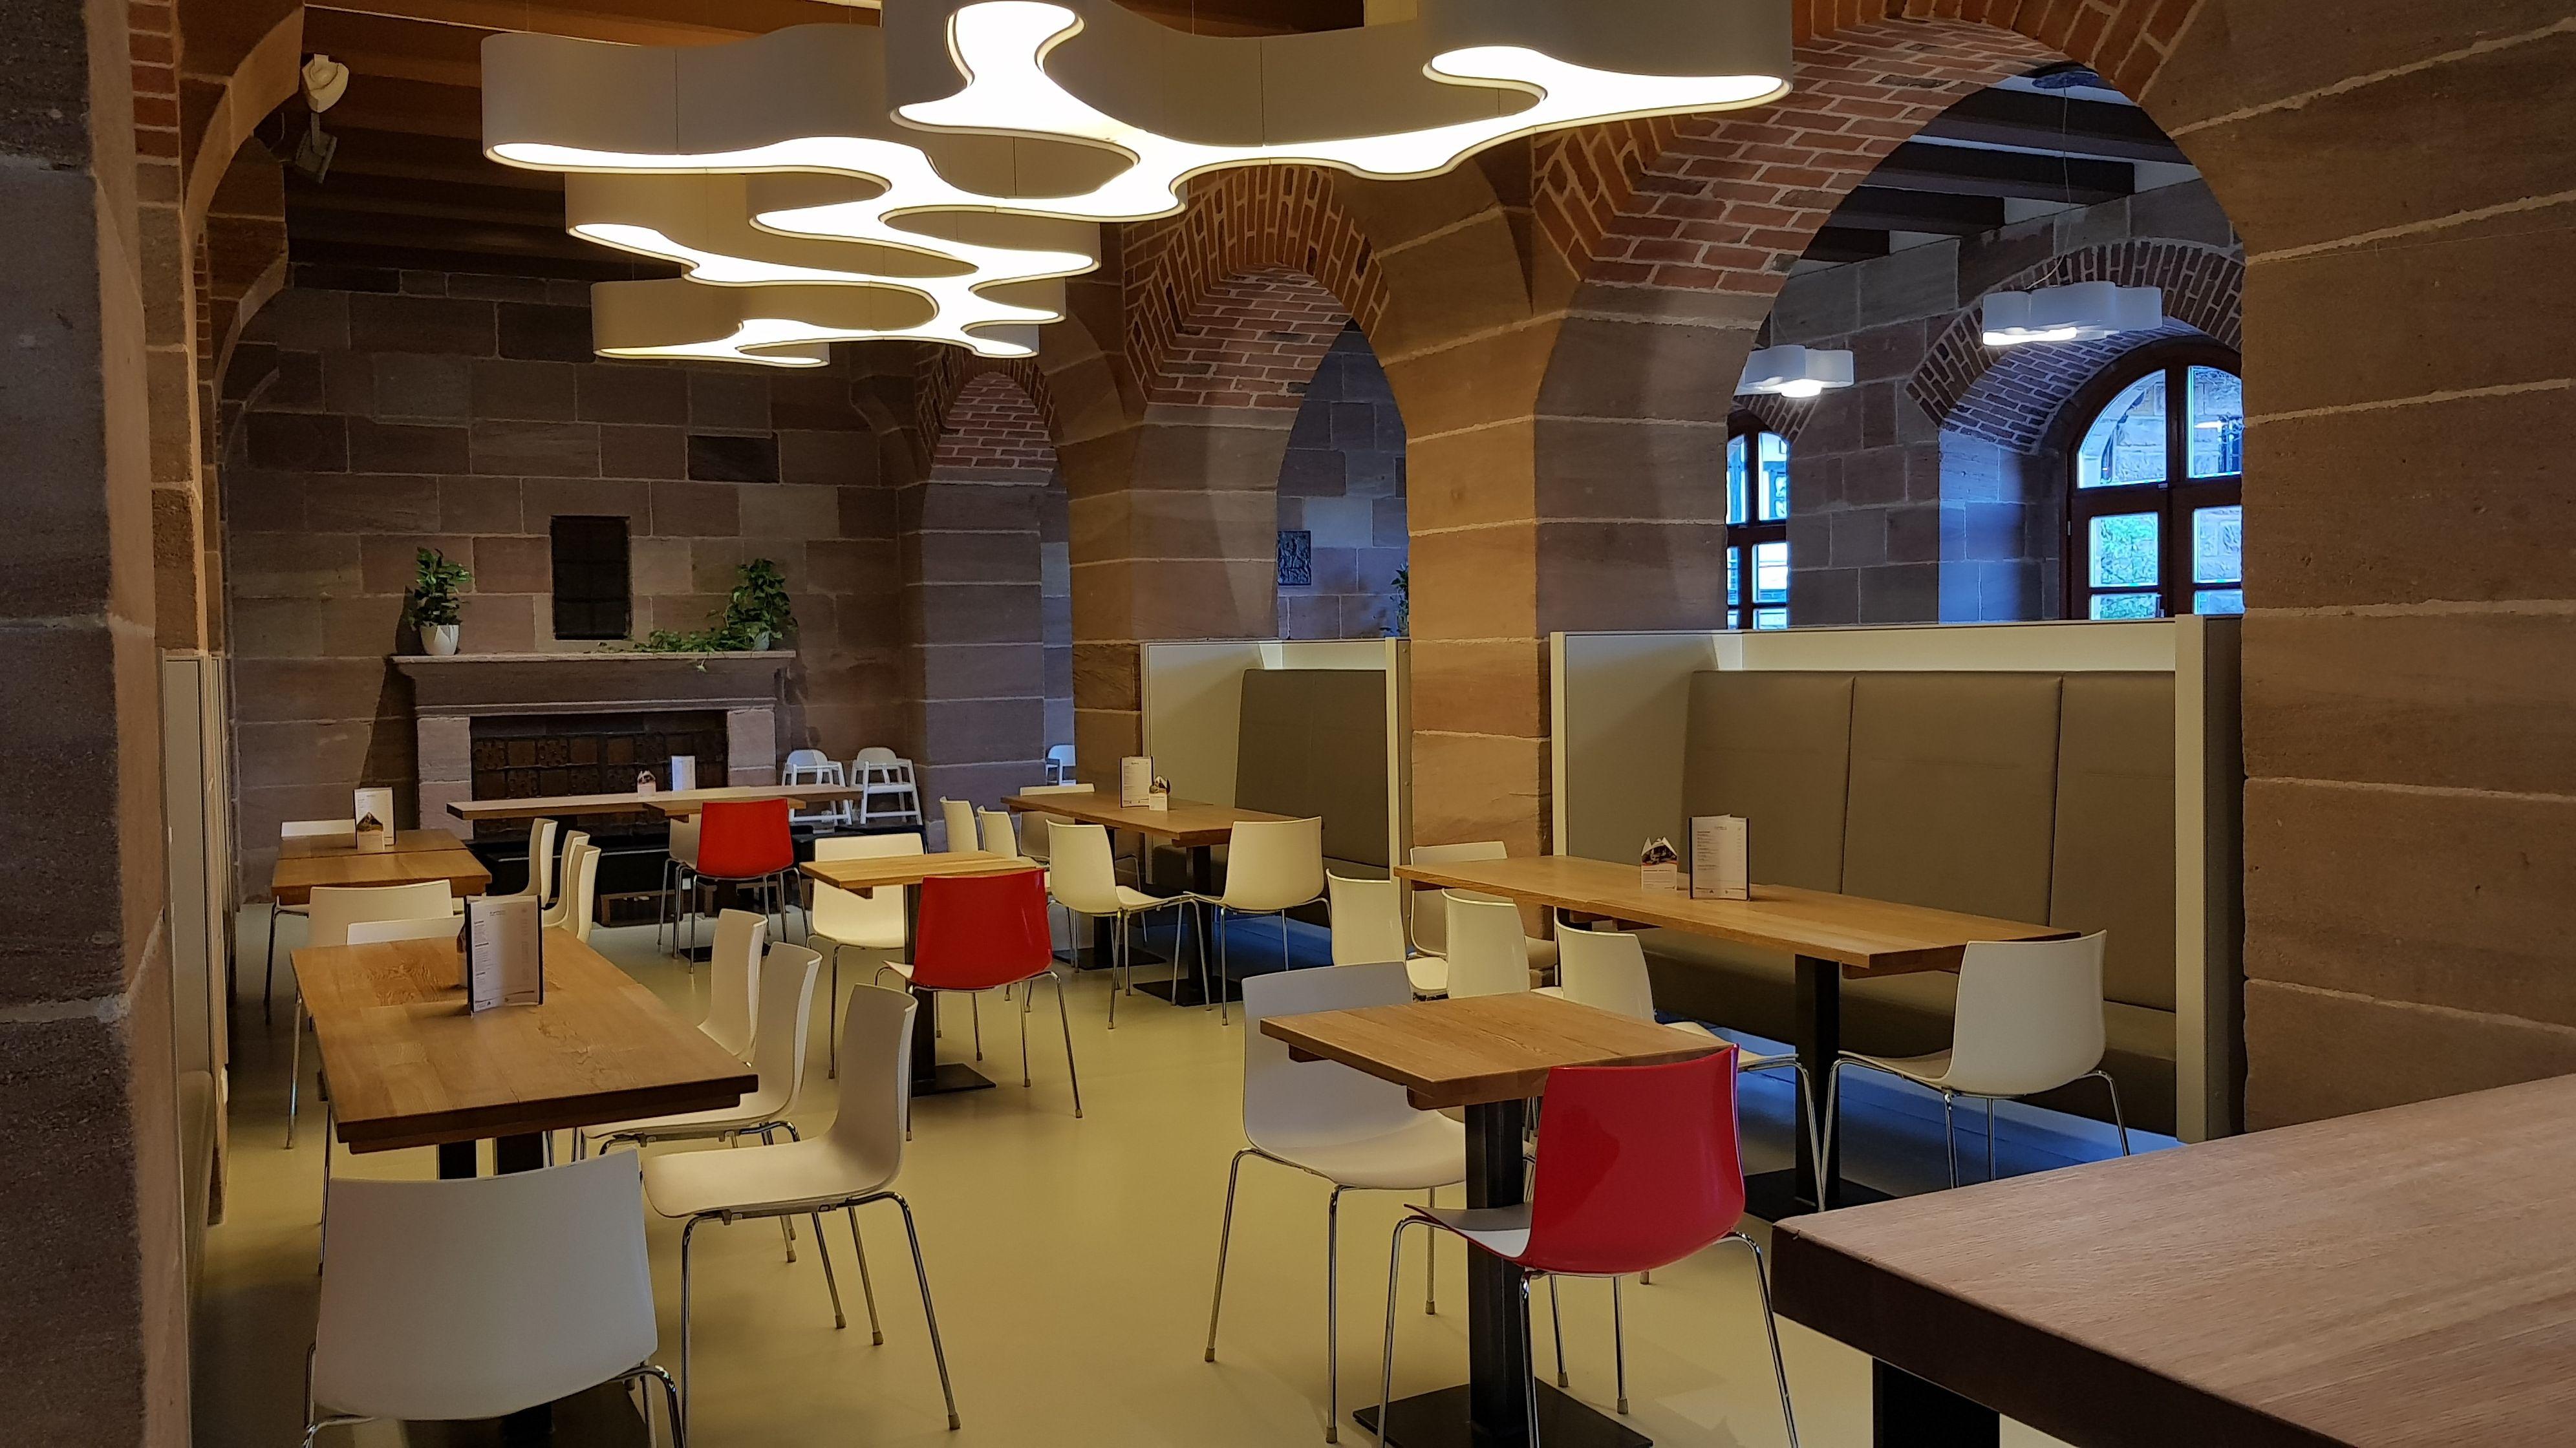 Spreisesaal Jugendherberge Nürnberg